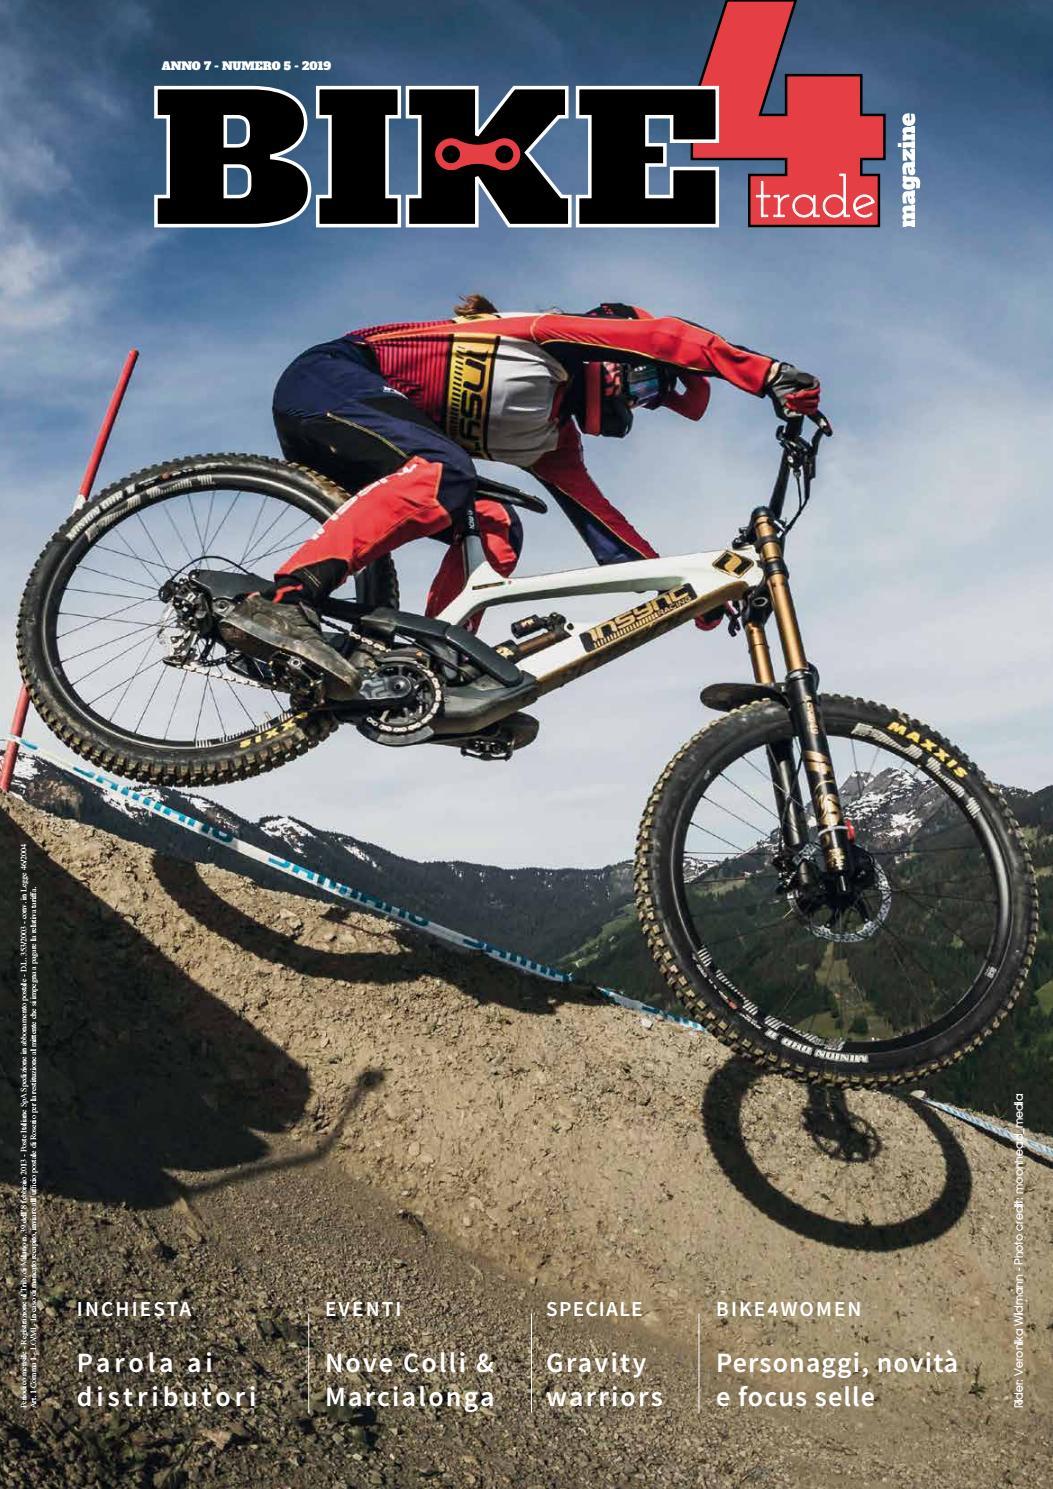 Boninbike Portaciclo c//rotelle MTB